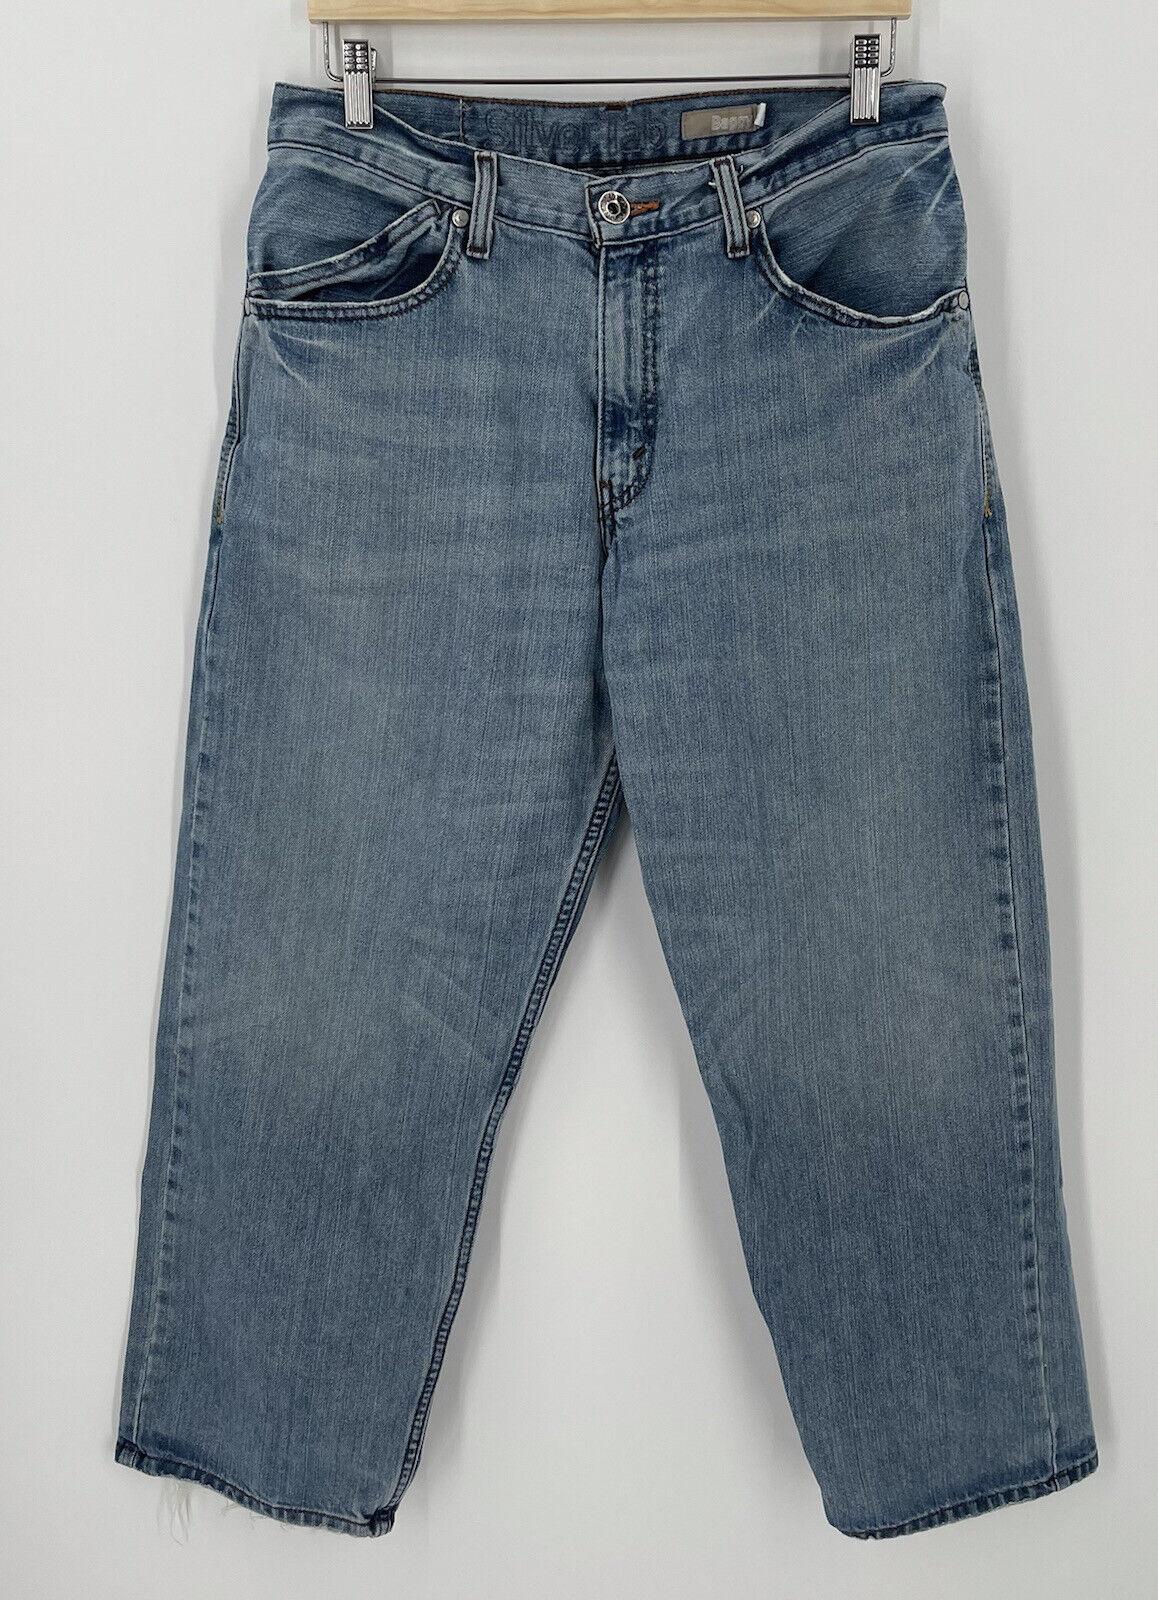 Vintage 90s Levis SilverTab Mens 32 x 29 Baggy De… - image 1